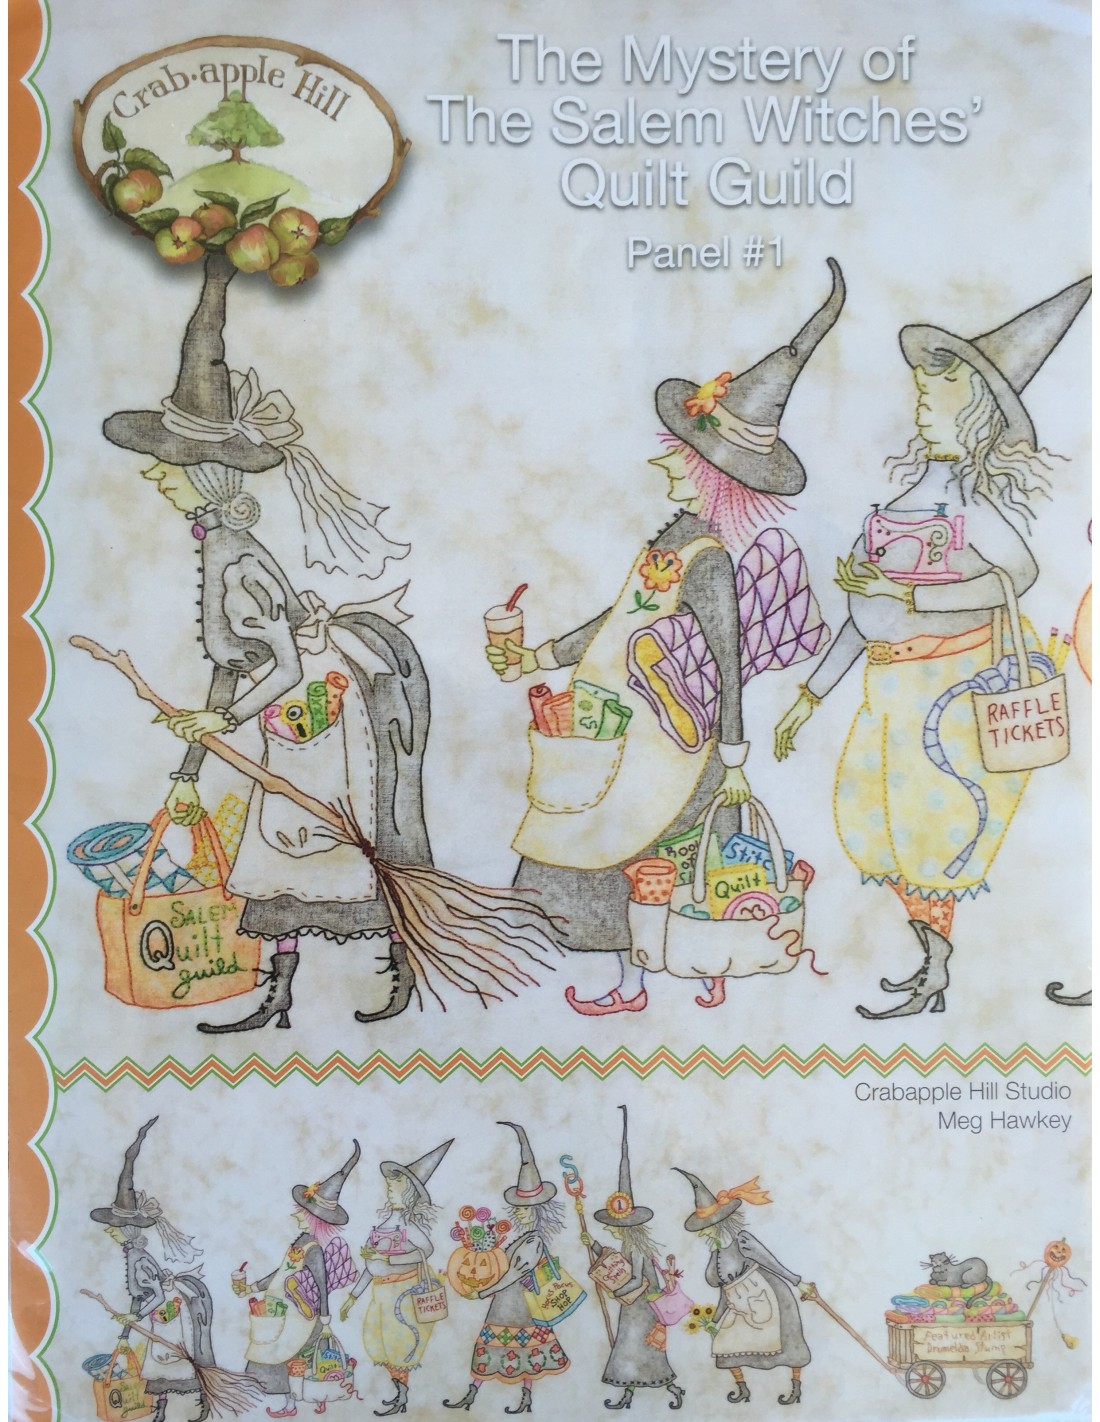 The 1692 Salem Witch Trials